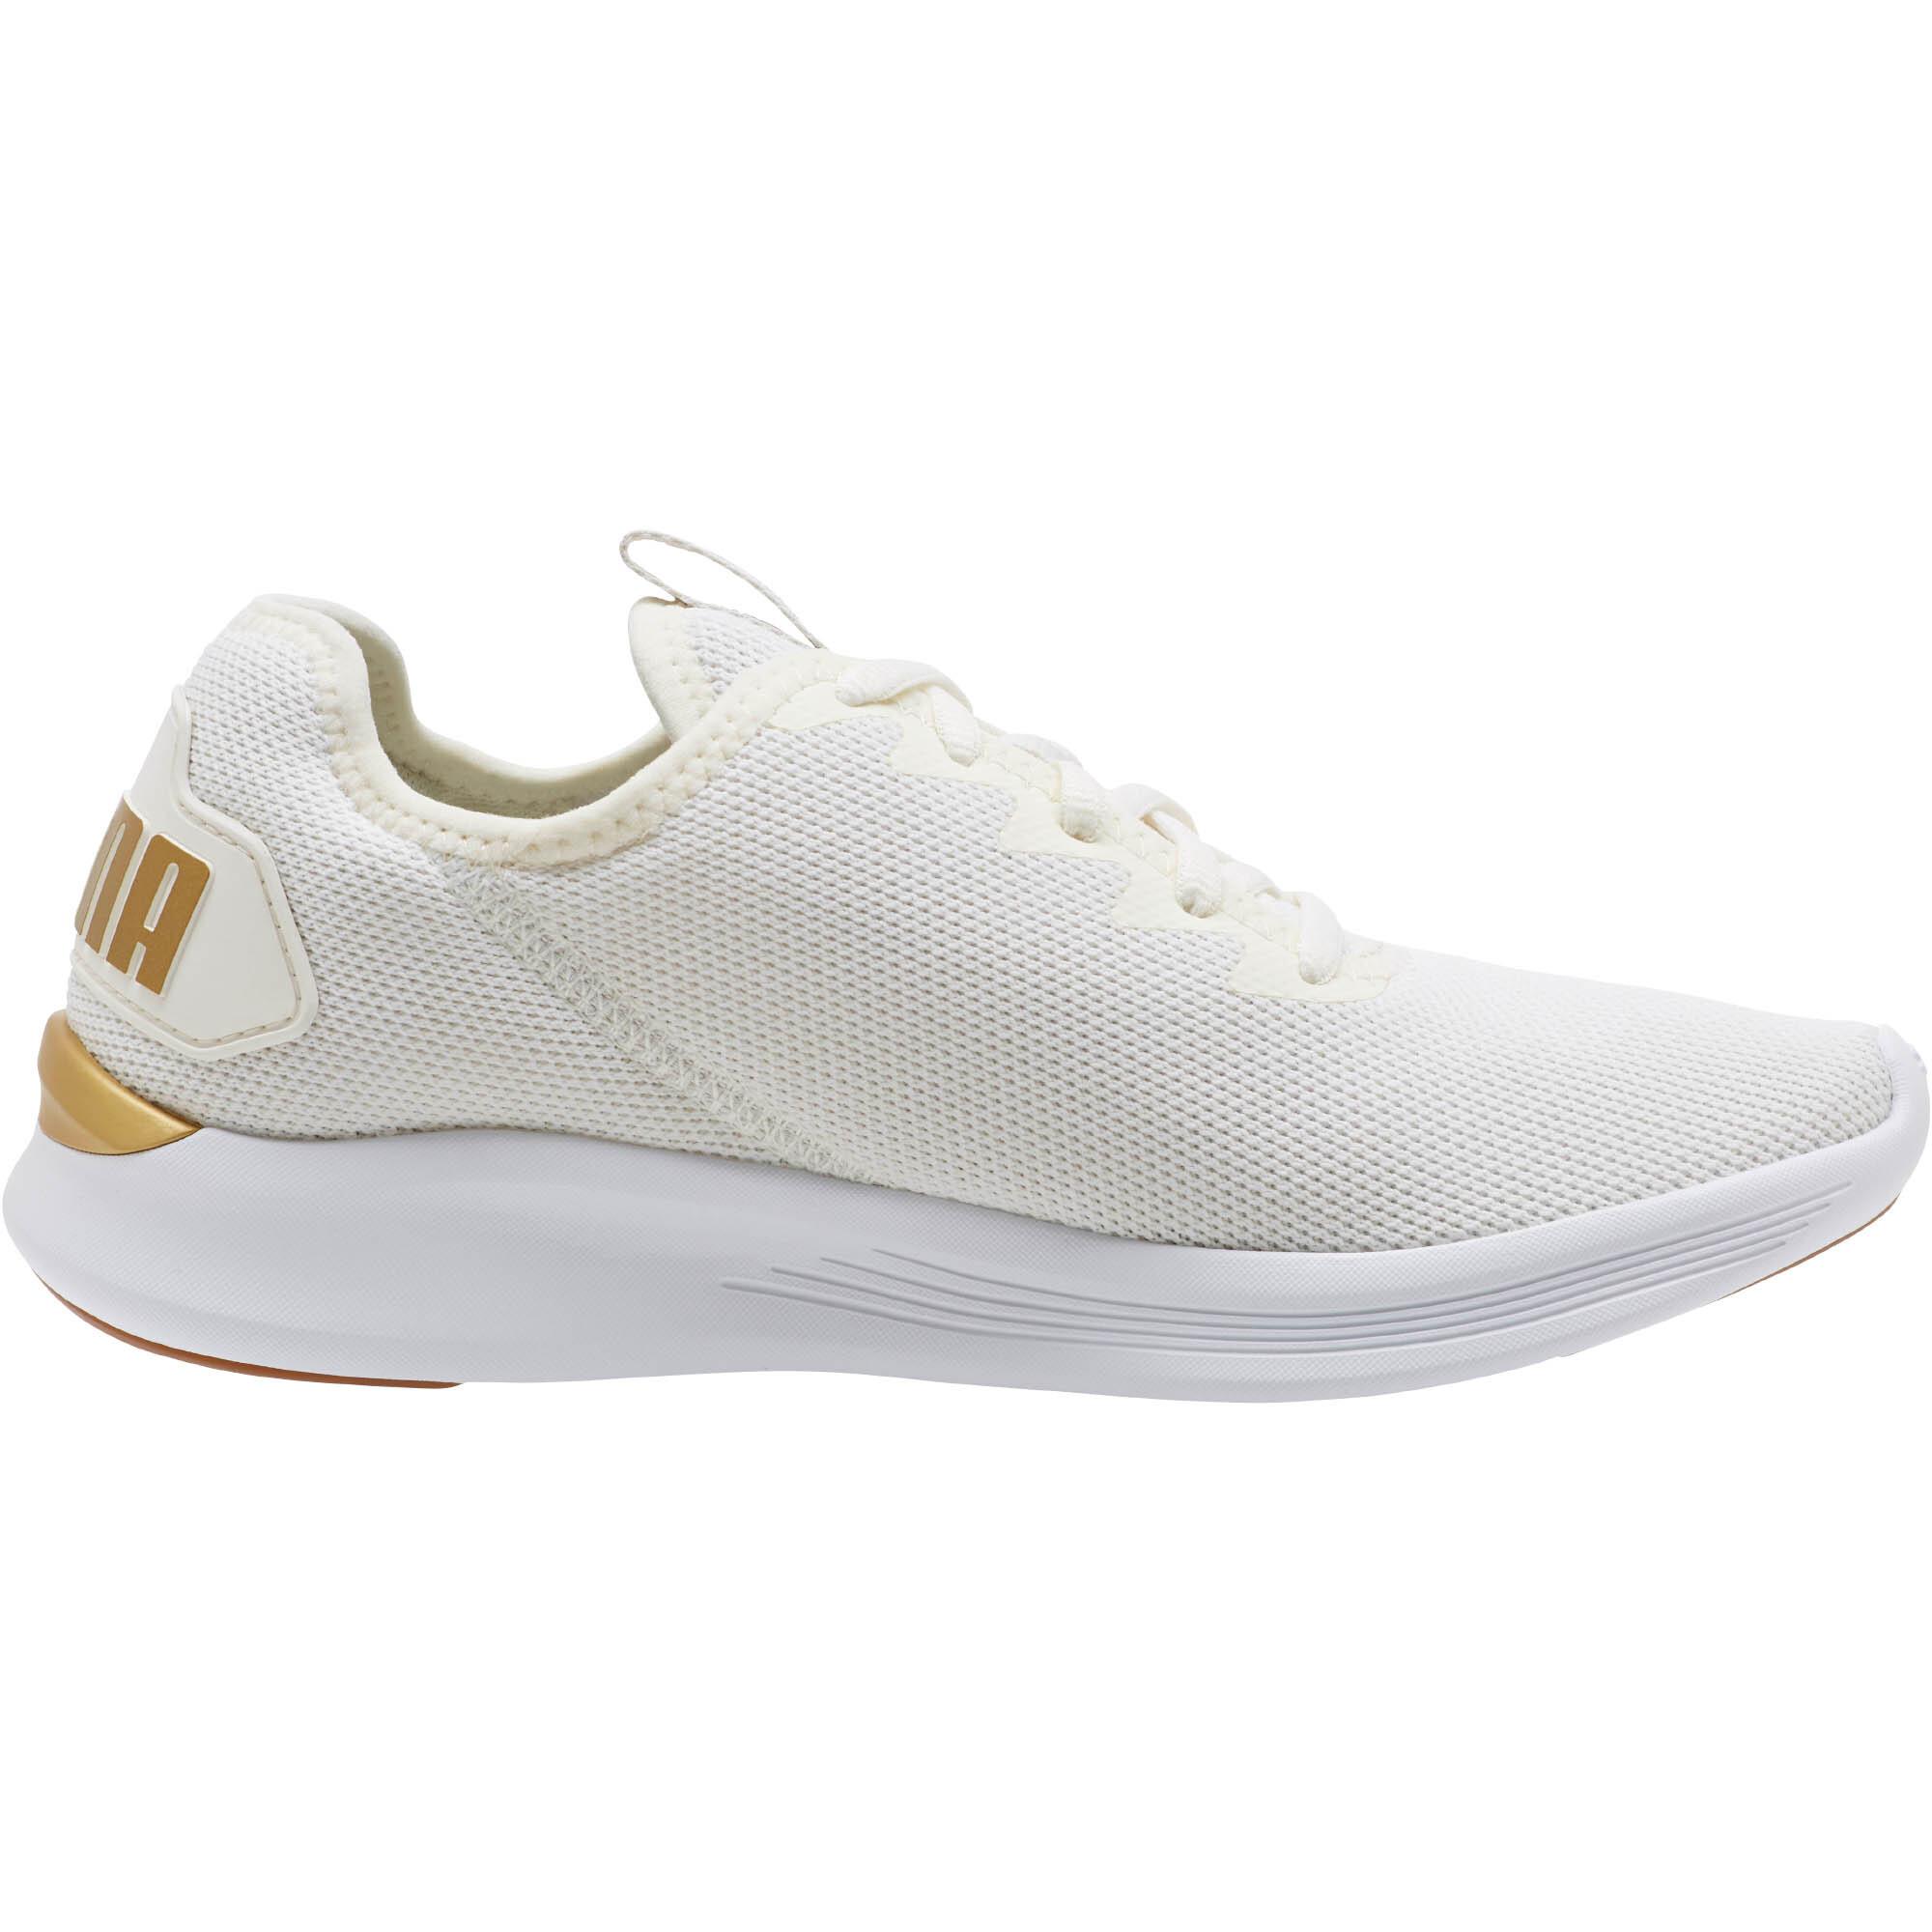 PUMA-Ballast-Women-039-s-Running-Shoes-Women-Shoe-Running thumbnail 15